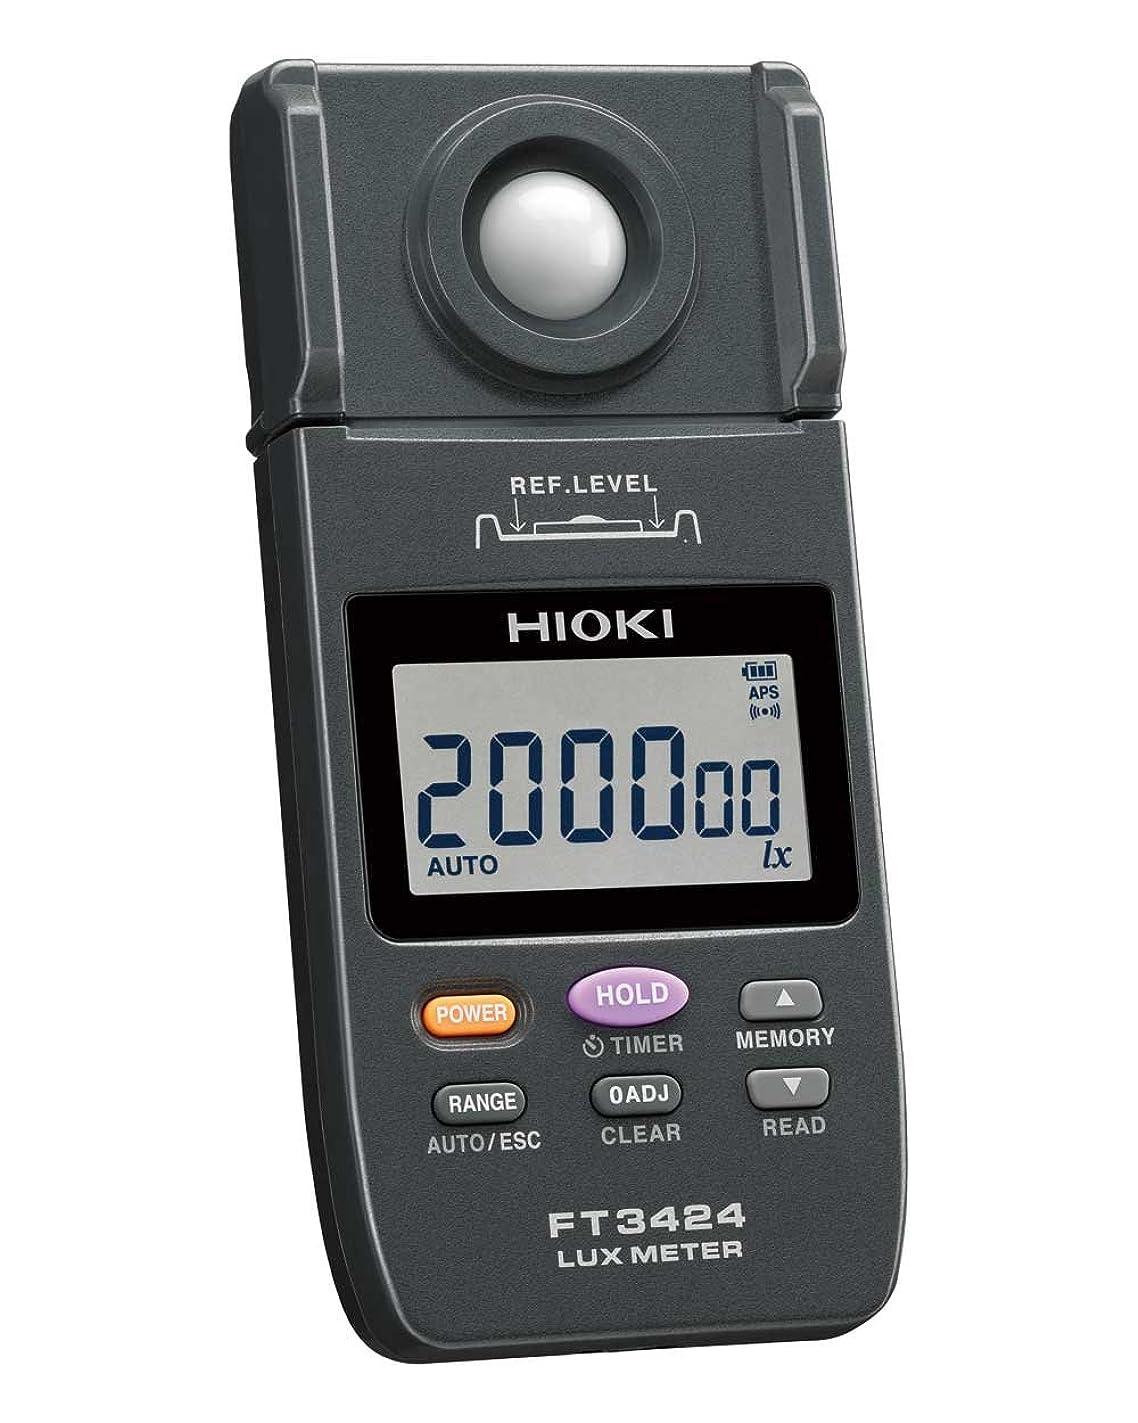 十分に兄弟愛熱意HIOKI (日置電機) 照度計 FT3424